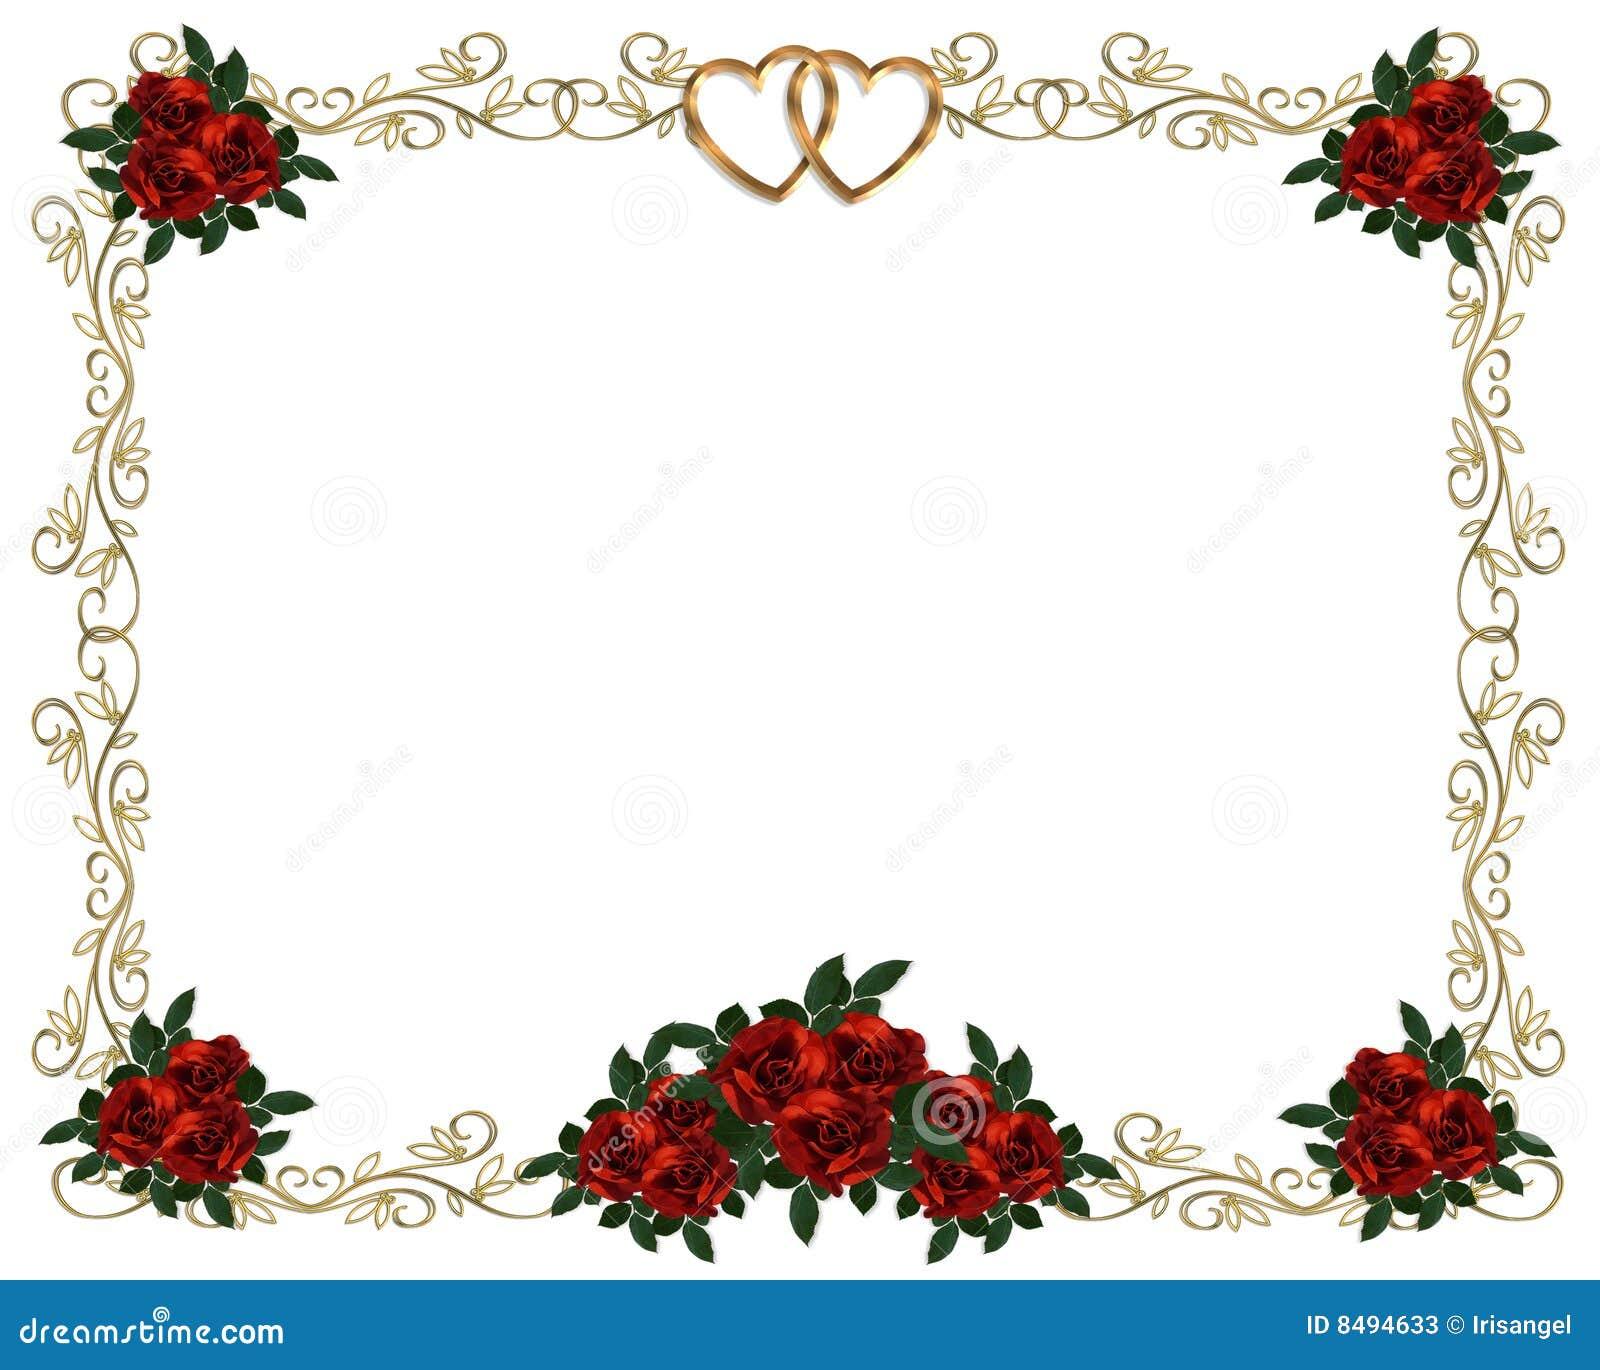 Wedding Invitations Long Island as awesome invitation design